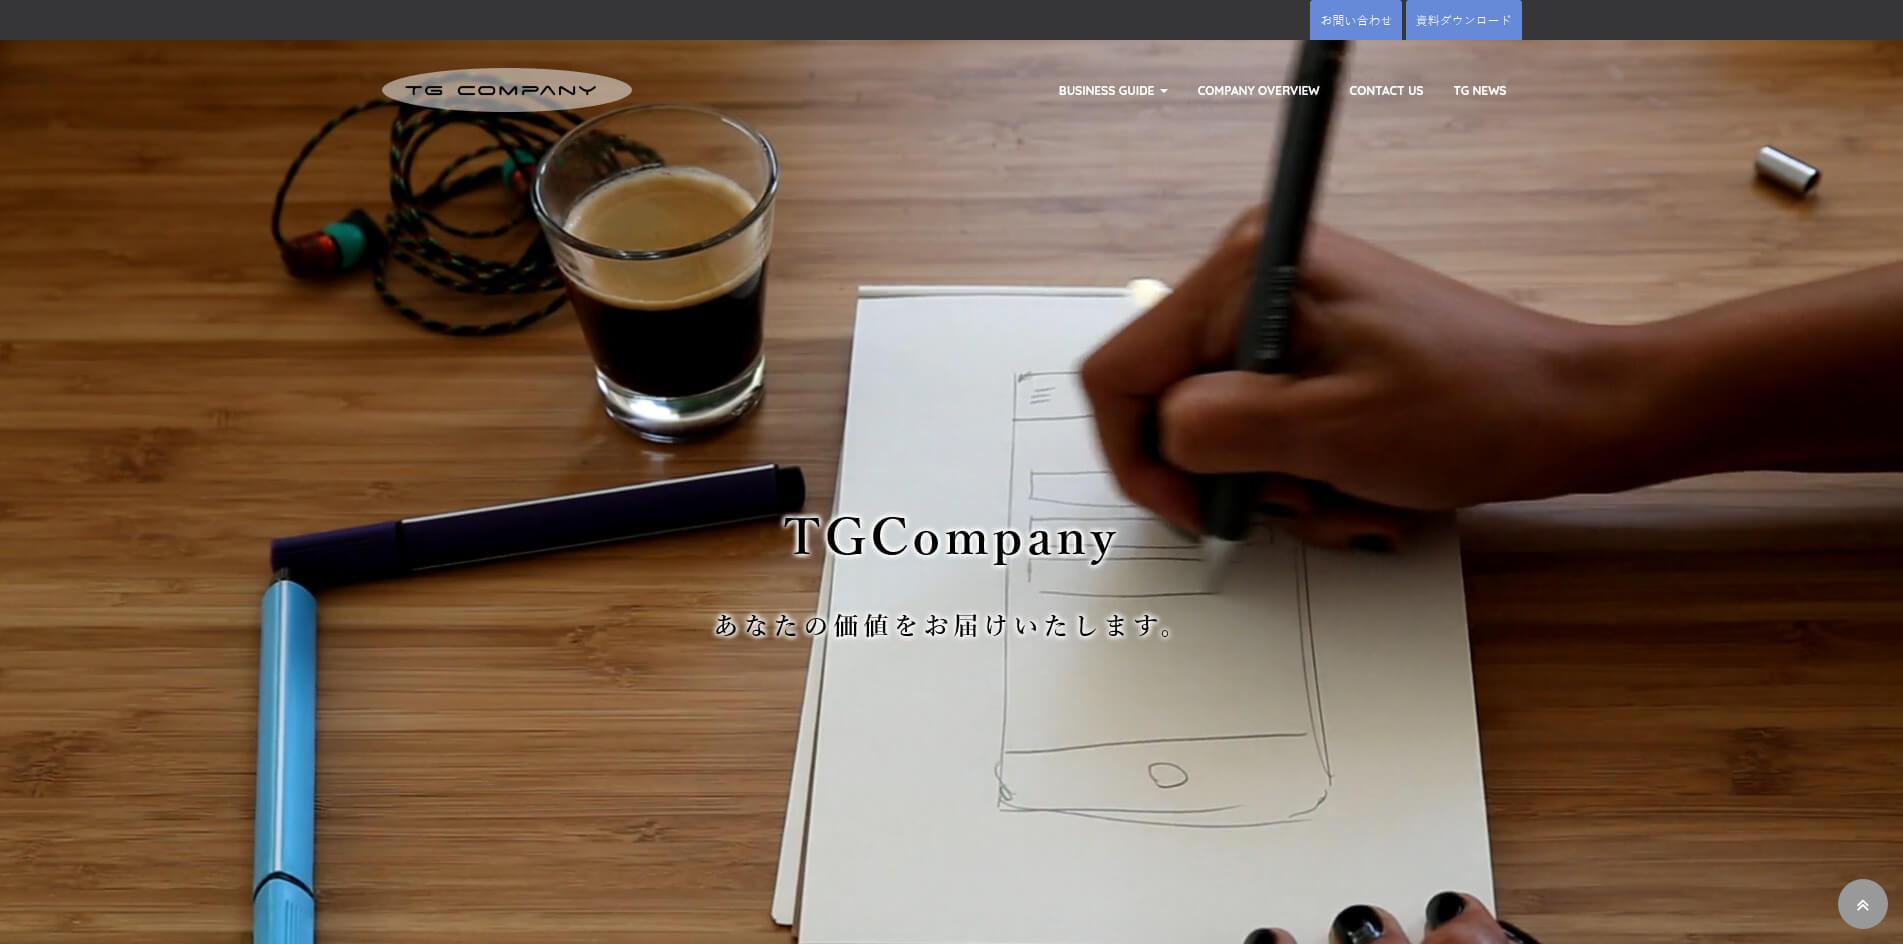 合同会社TGCompany